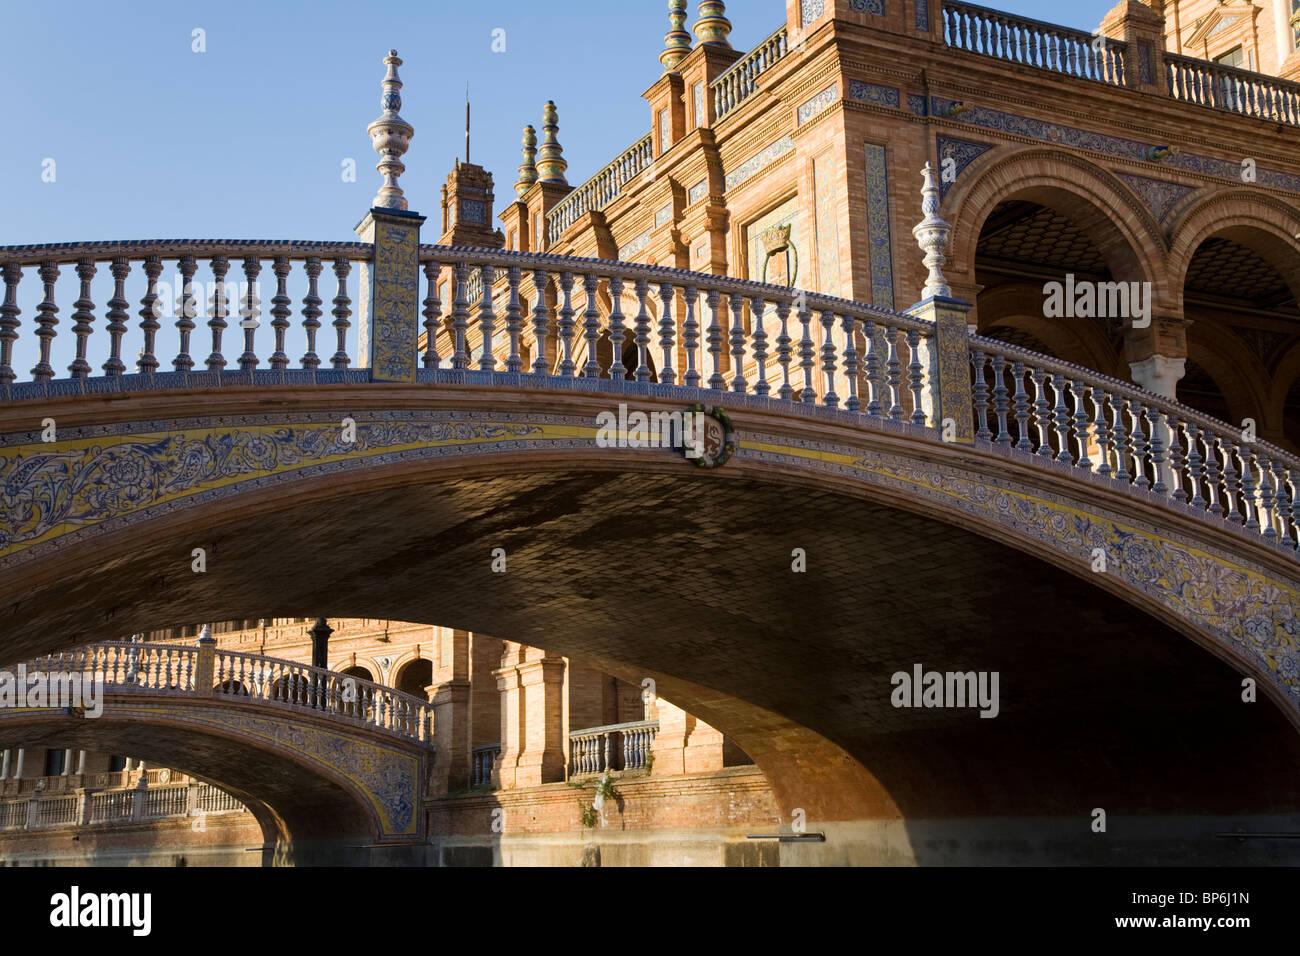 A bridge crossing / crosses over the moat of Seville's Plaza de España de Sevilla. Seville, Spain. On a - Stock Image